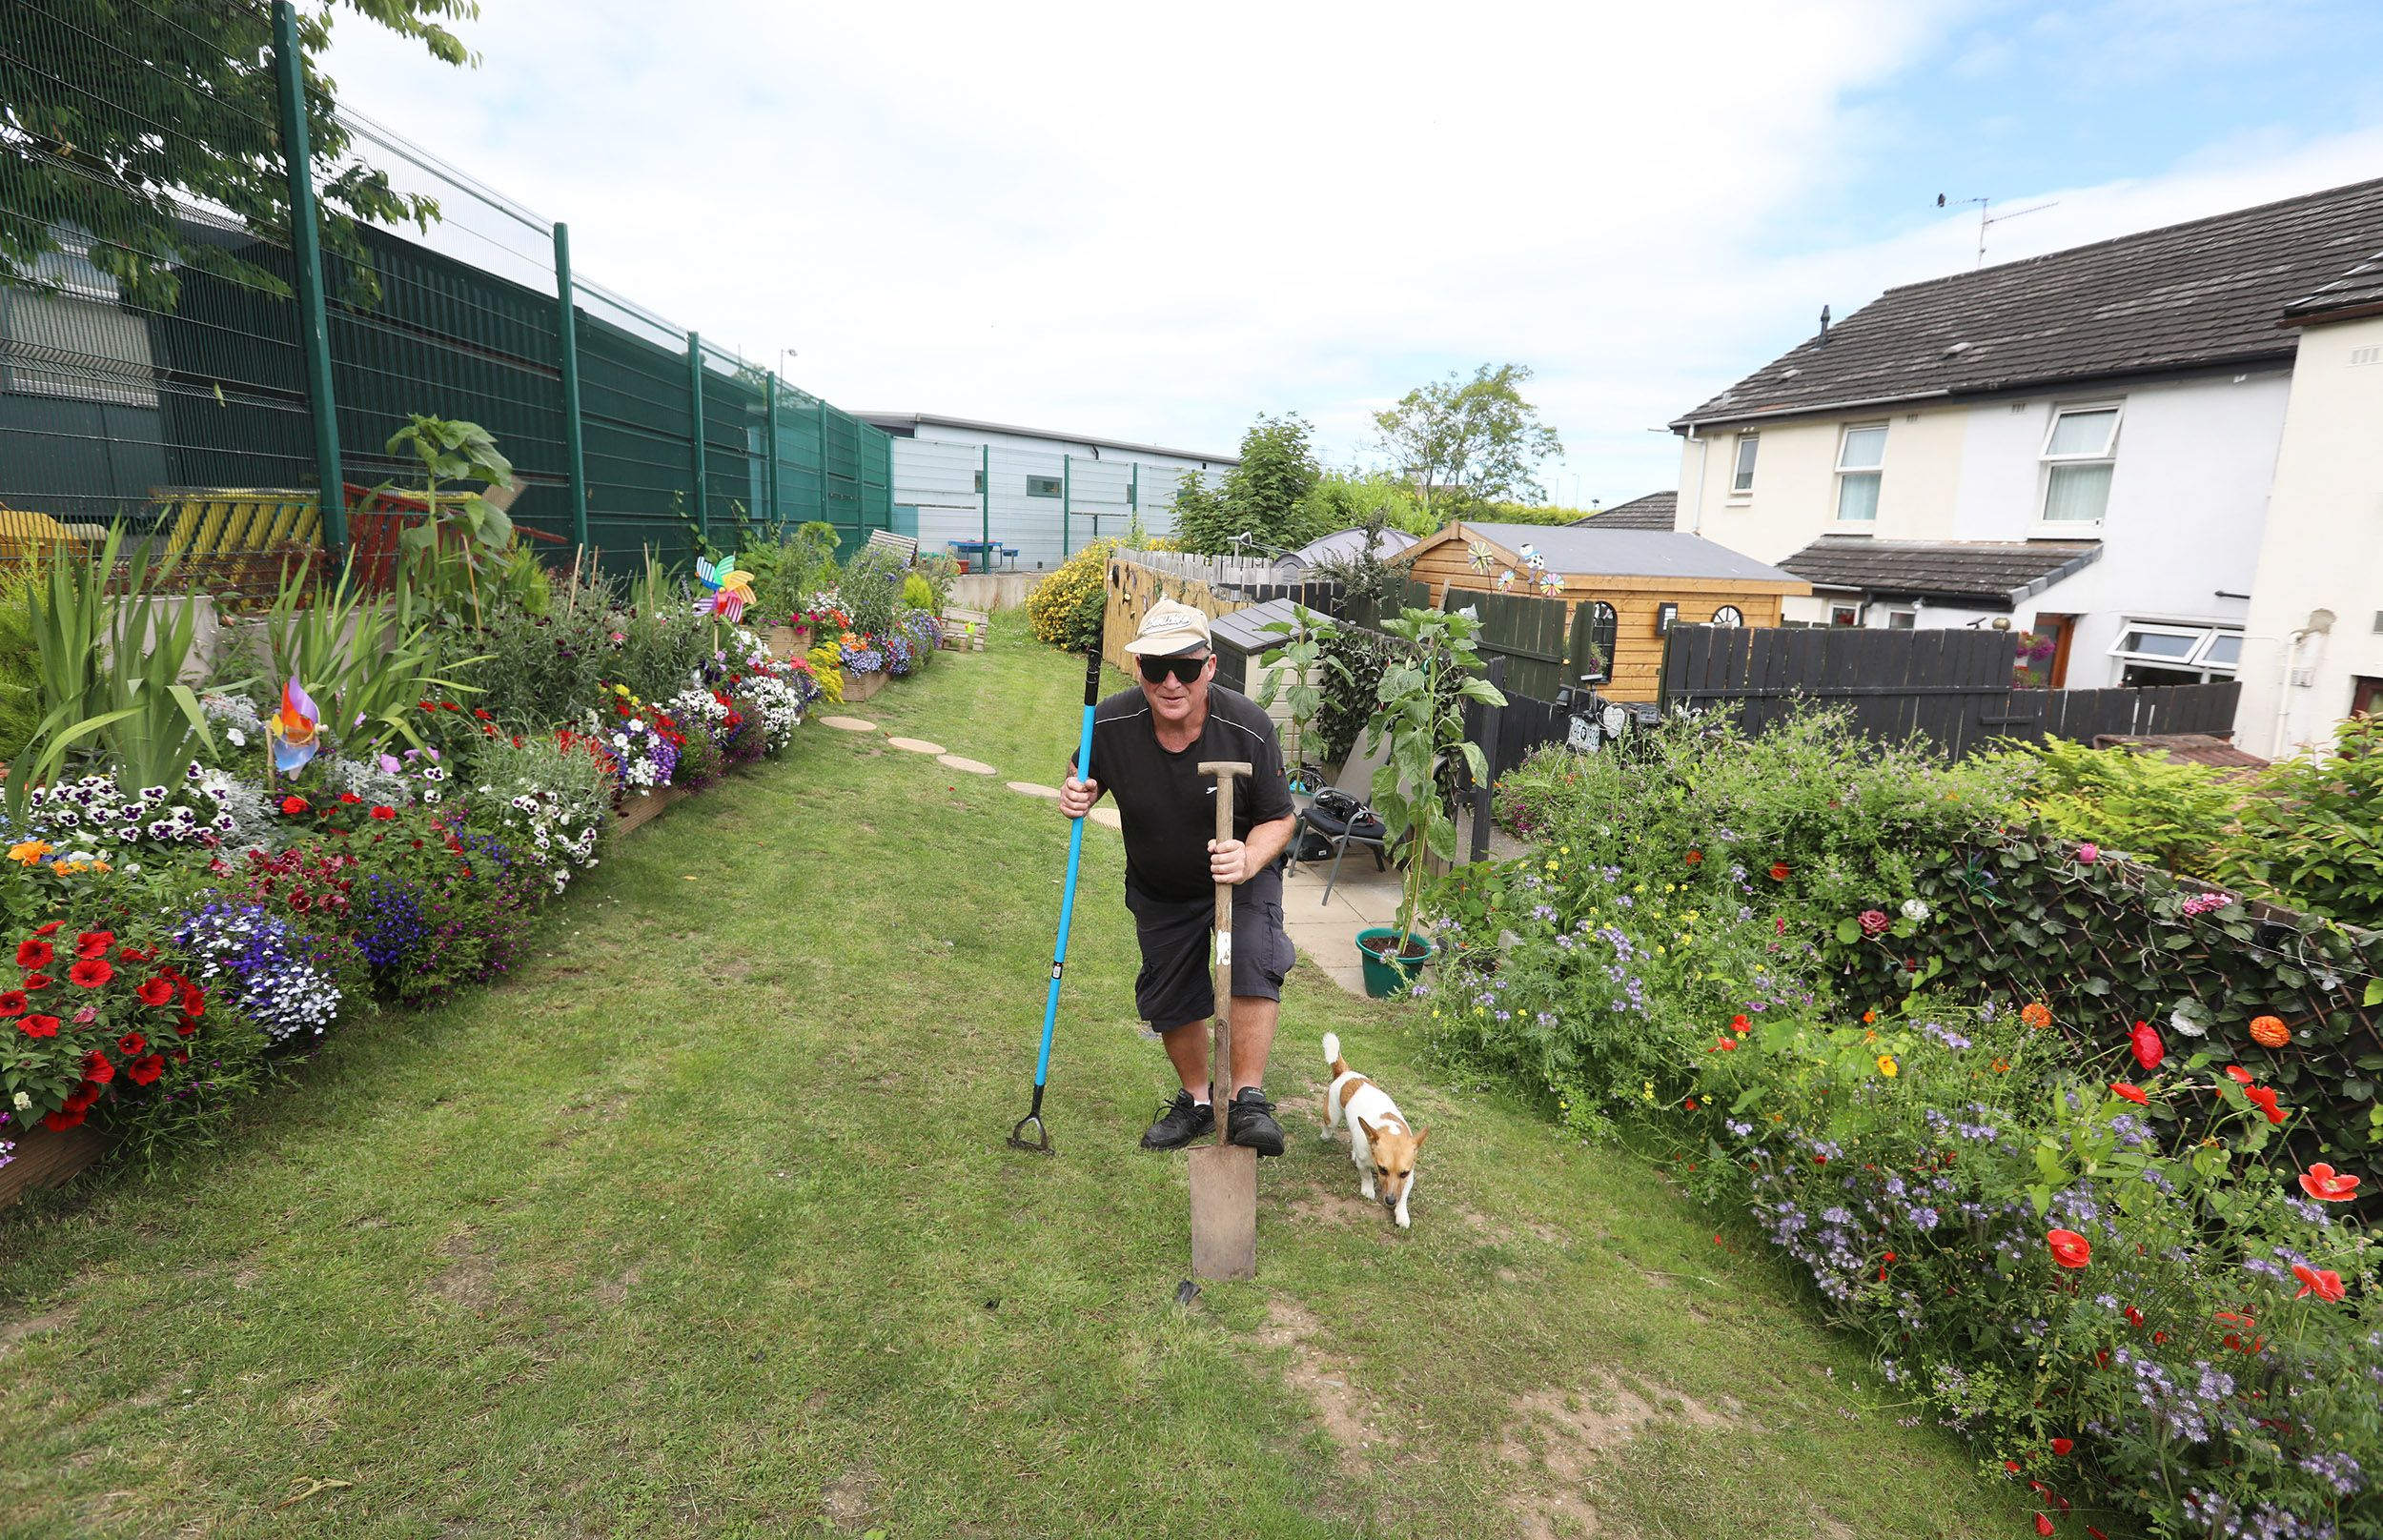 PARADISE: Terry Johnson and his dog Keano enjoy the colourful garden